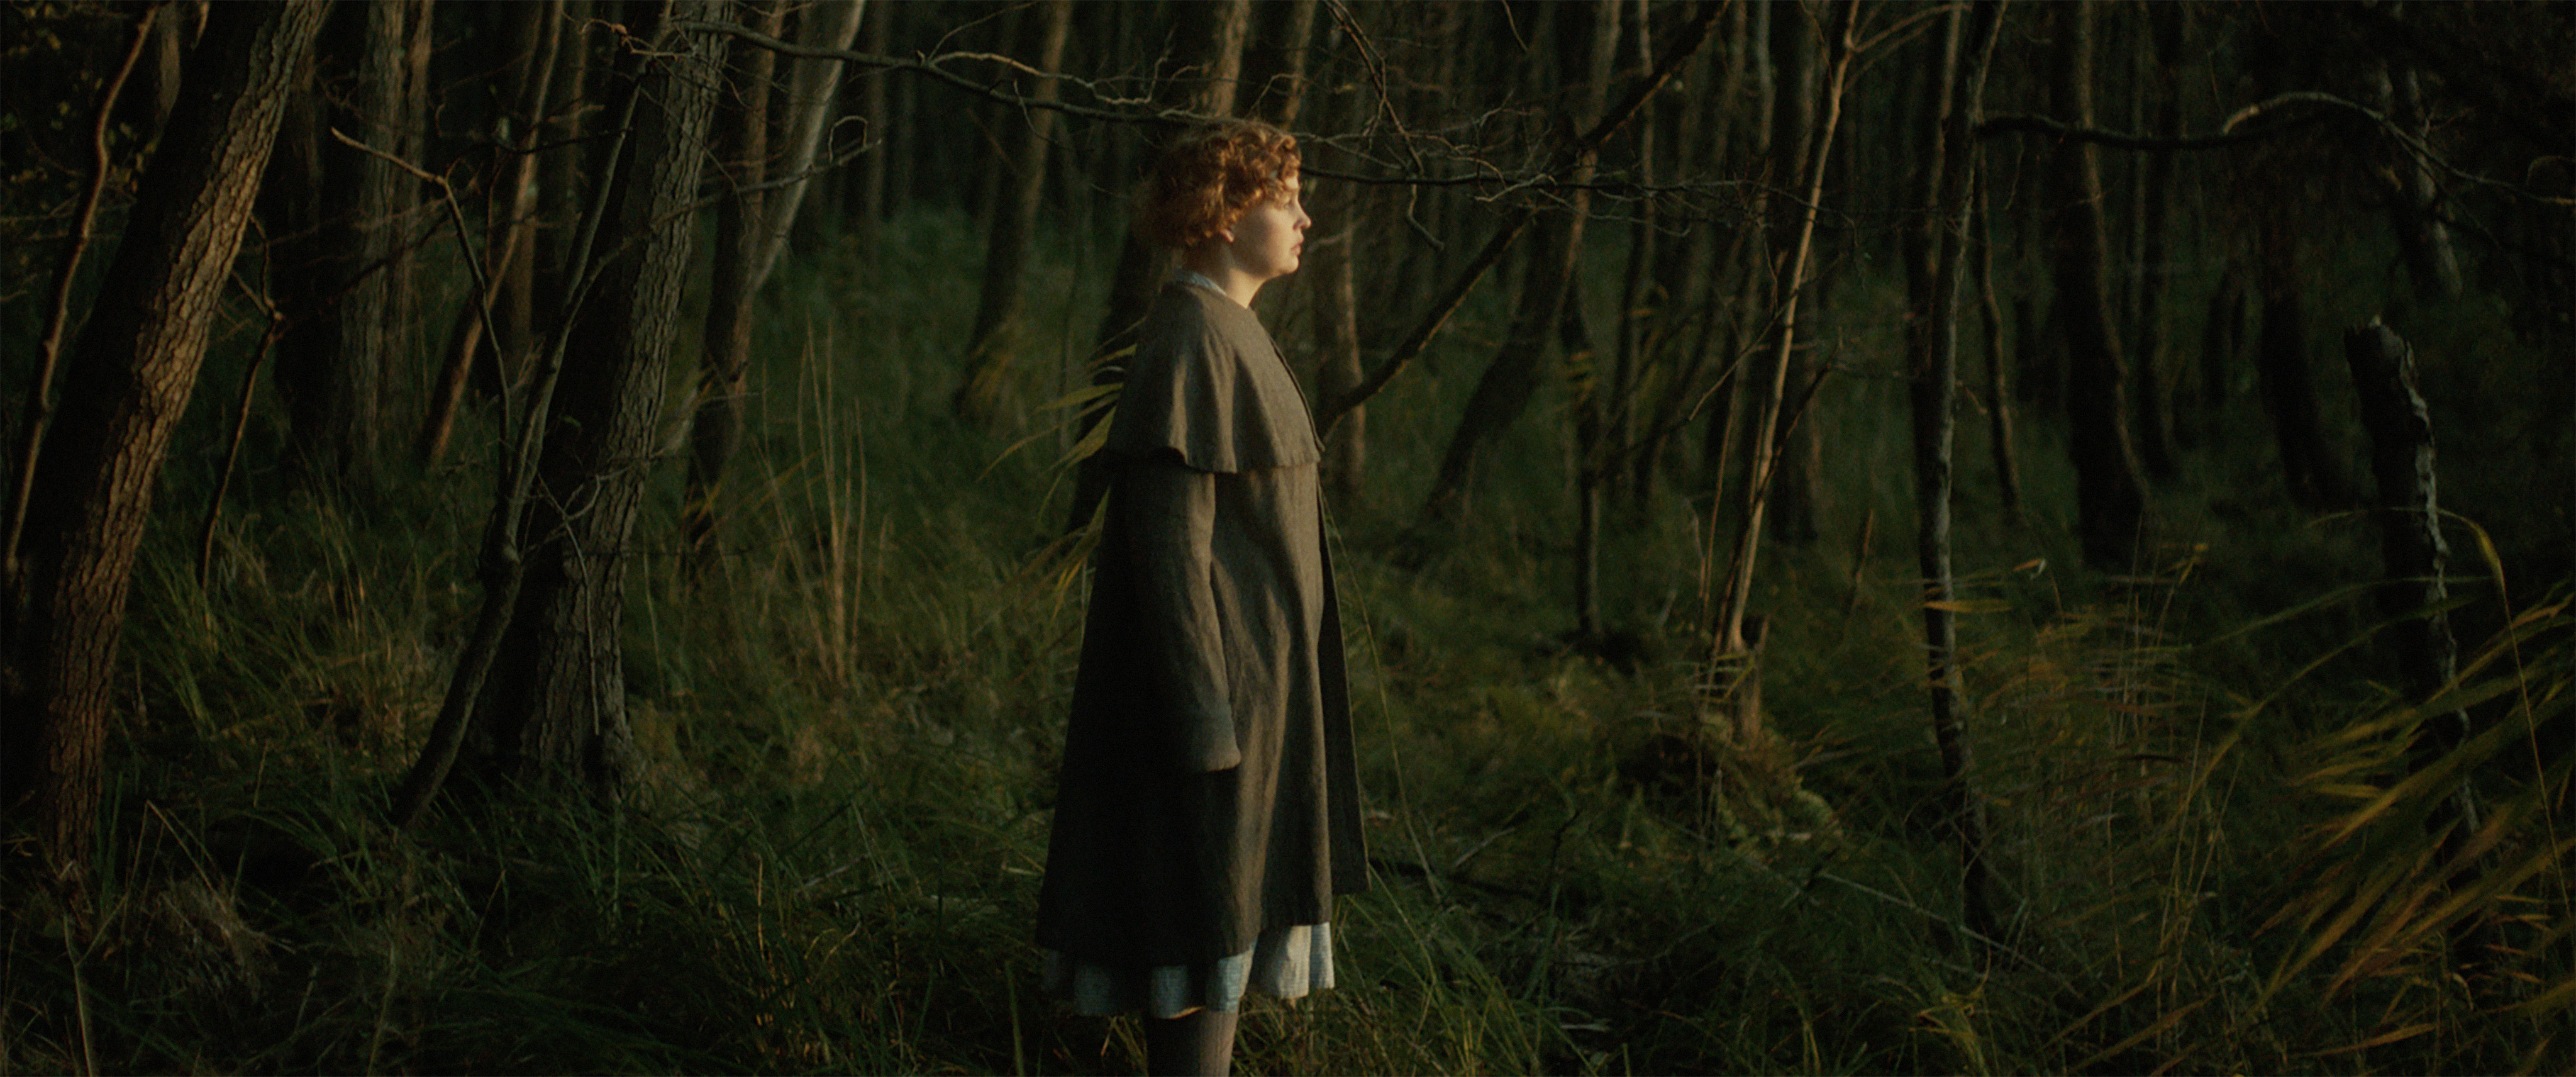 The Council of Birds: Eva Maria Jost in una scena del film di Timm Kröger